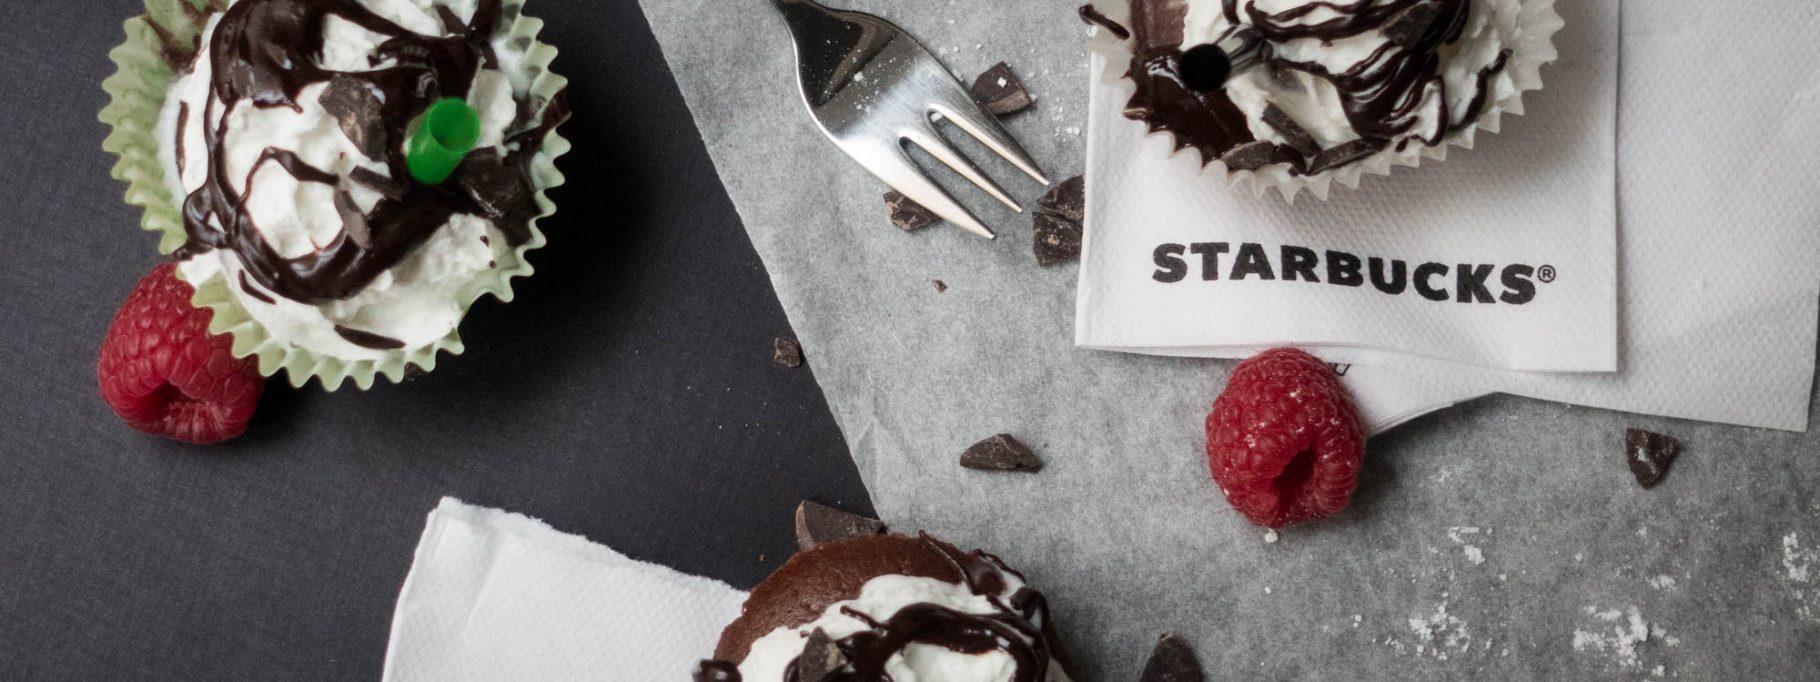 Frappuccino Inspired Vegan Cupcakes <br> Happy Birthday Starbucks!